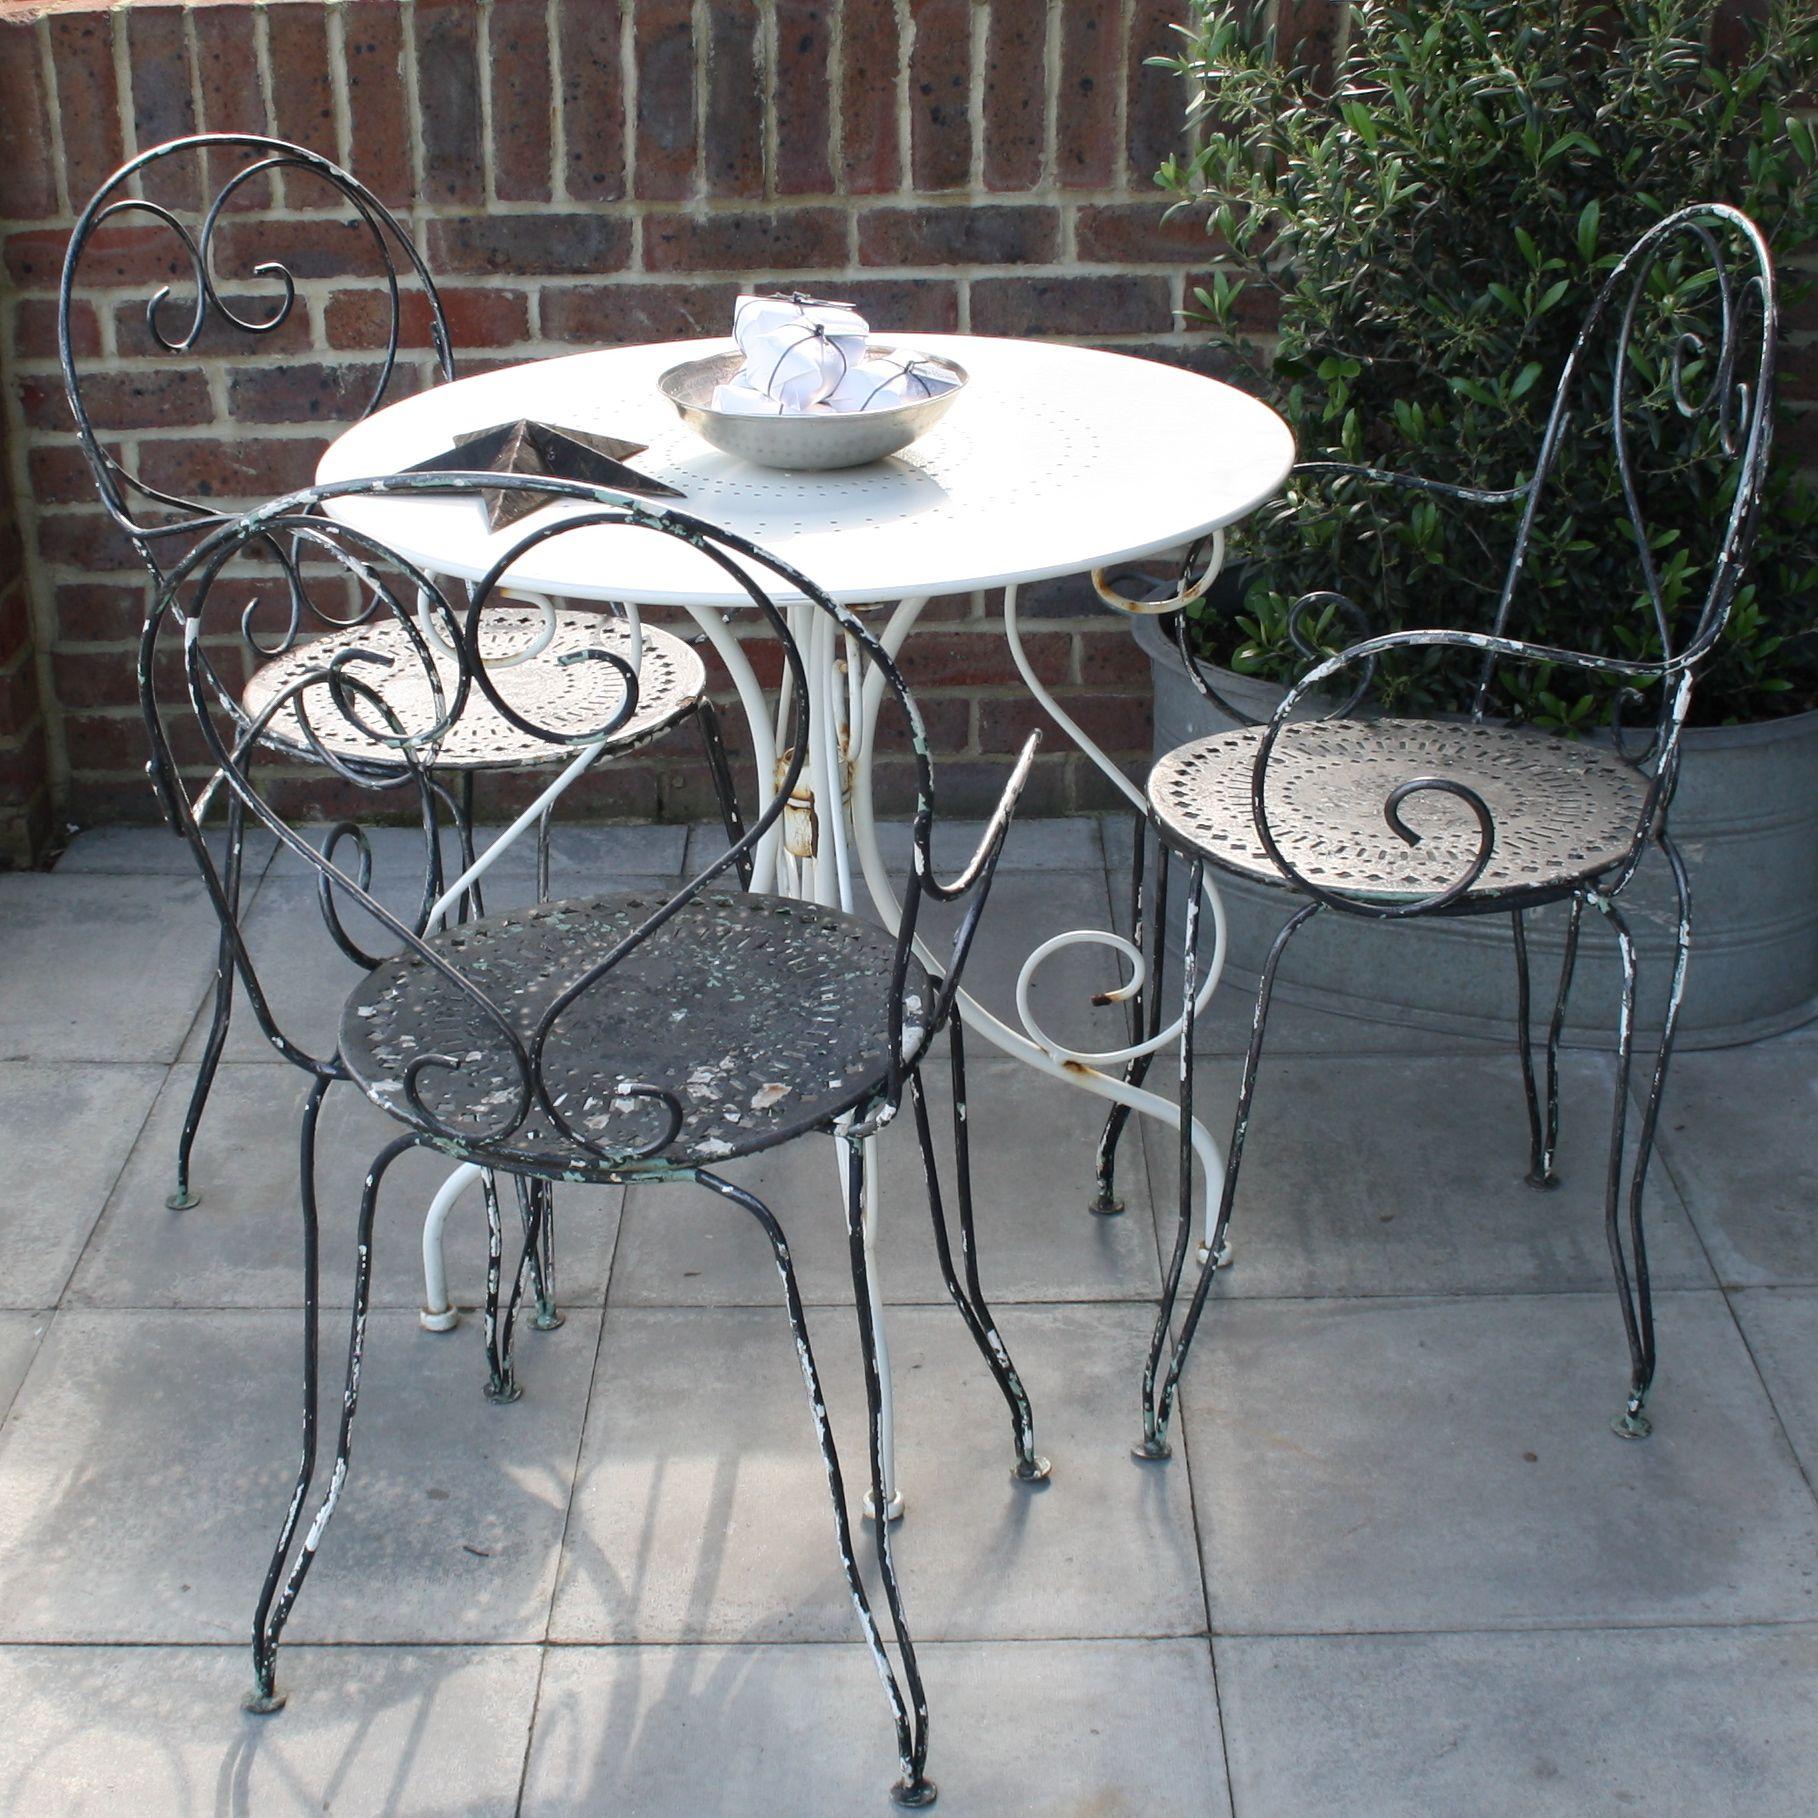 Vintage French Bistro Set Www Designvintage Co Uk Patio Furnishings Outdoor Patio Decor Outdoor Patio Set